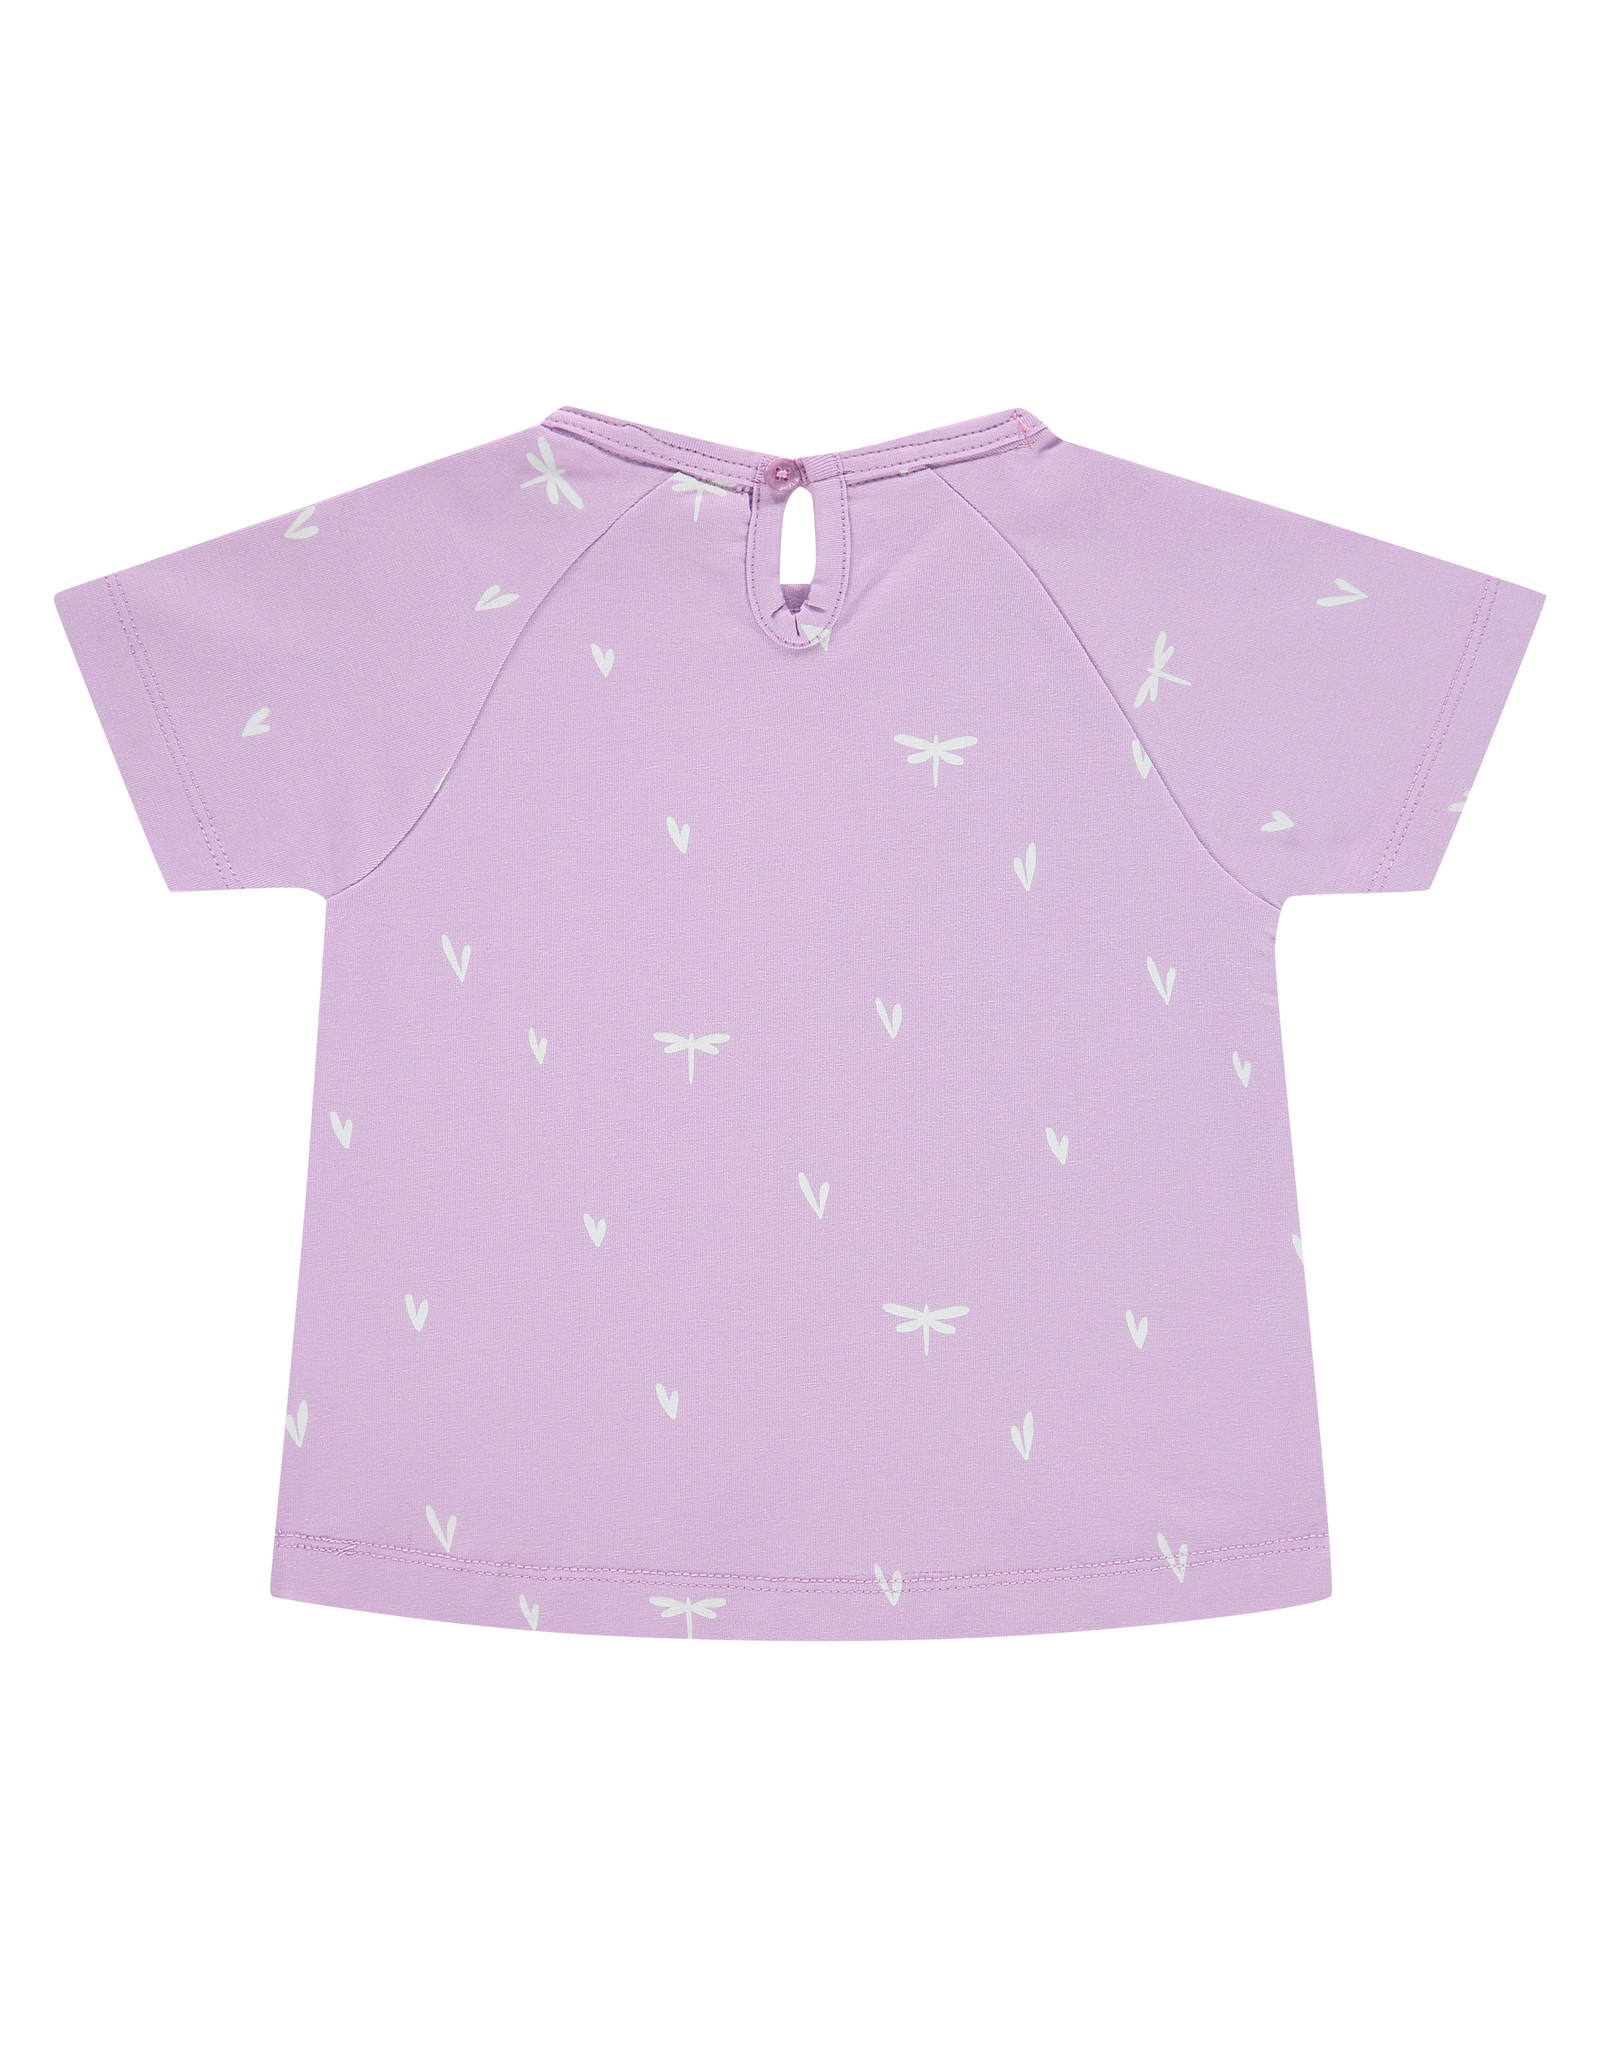 Babyface girls t-shirt short sleeve, lilac, BBE21108632